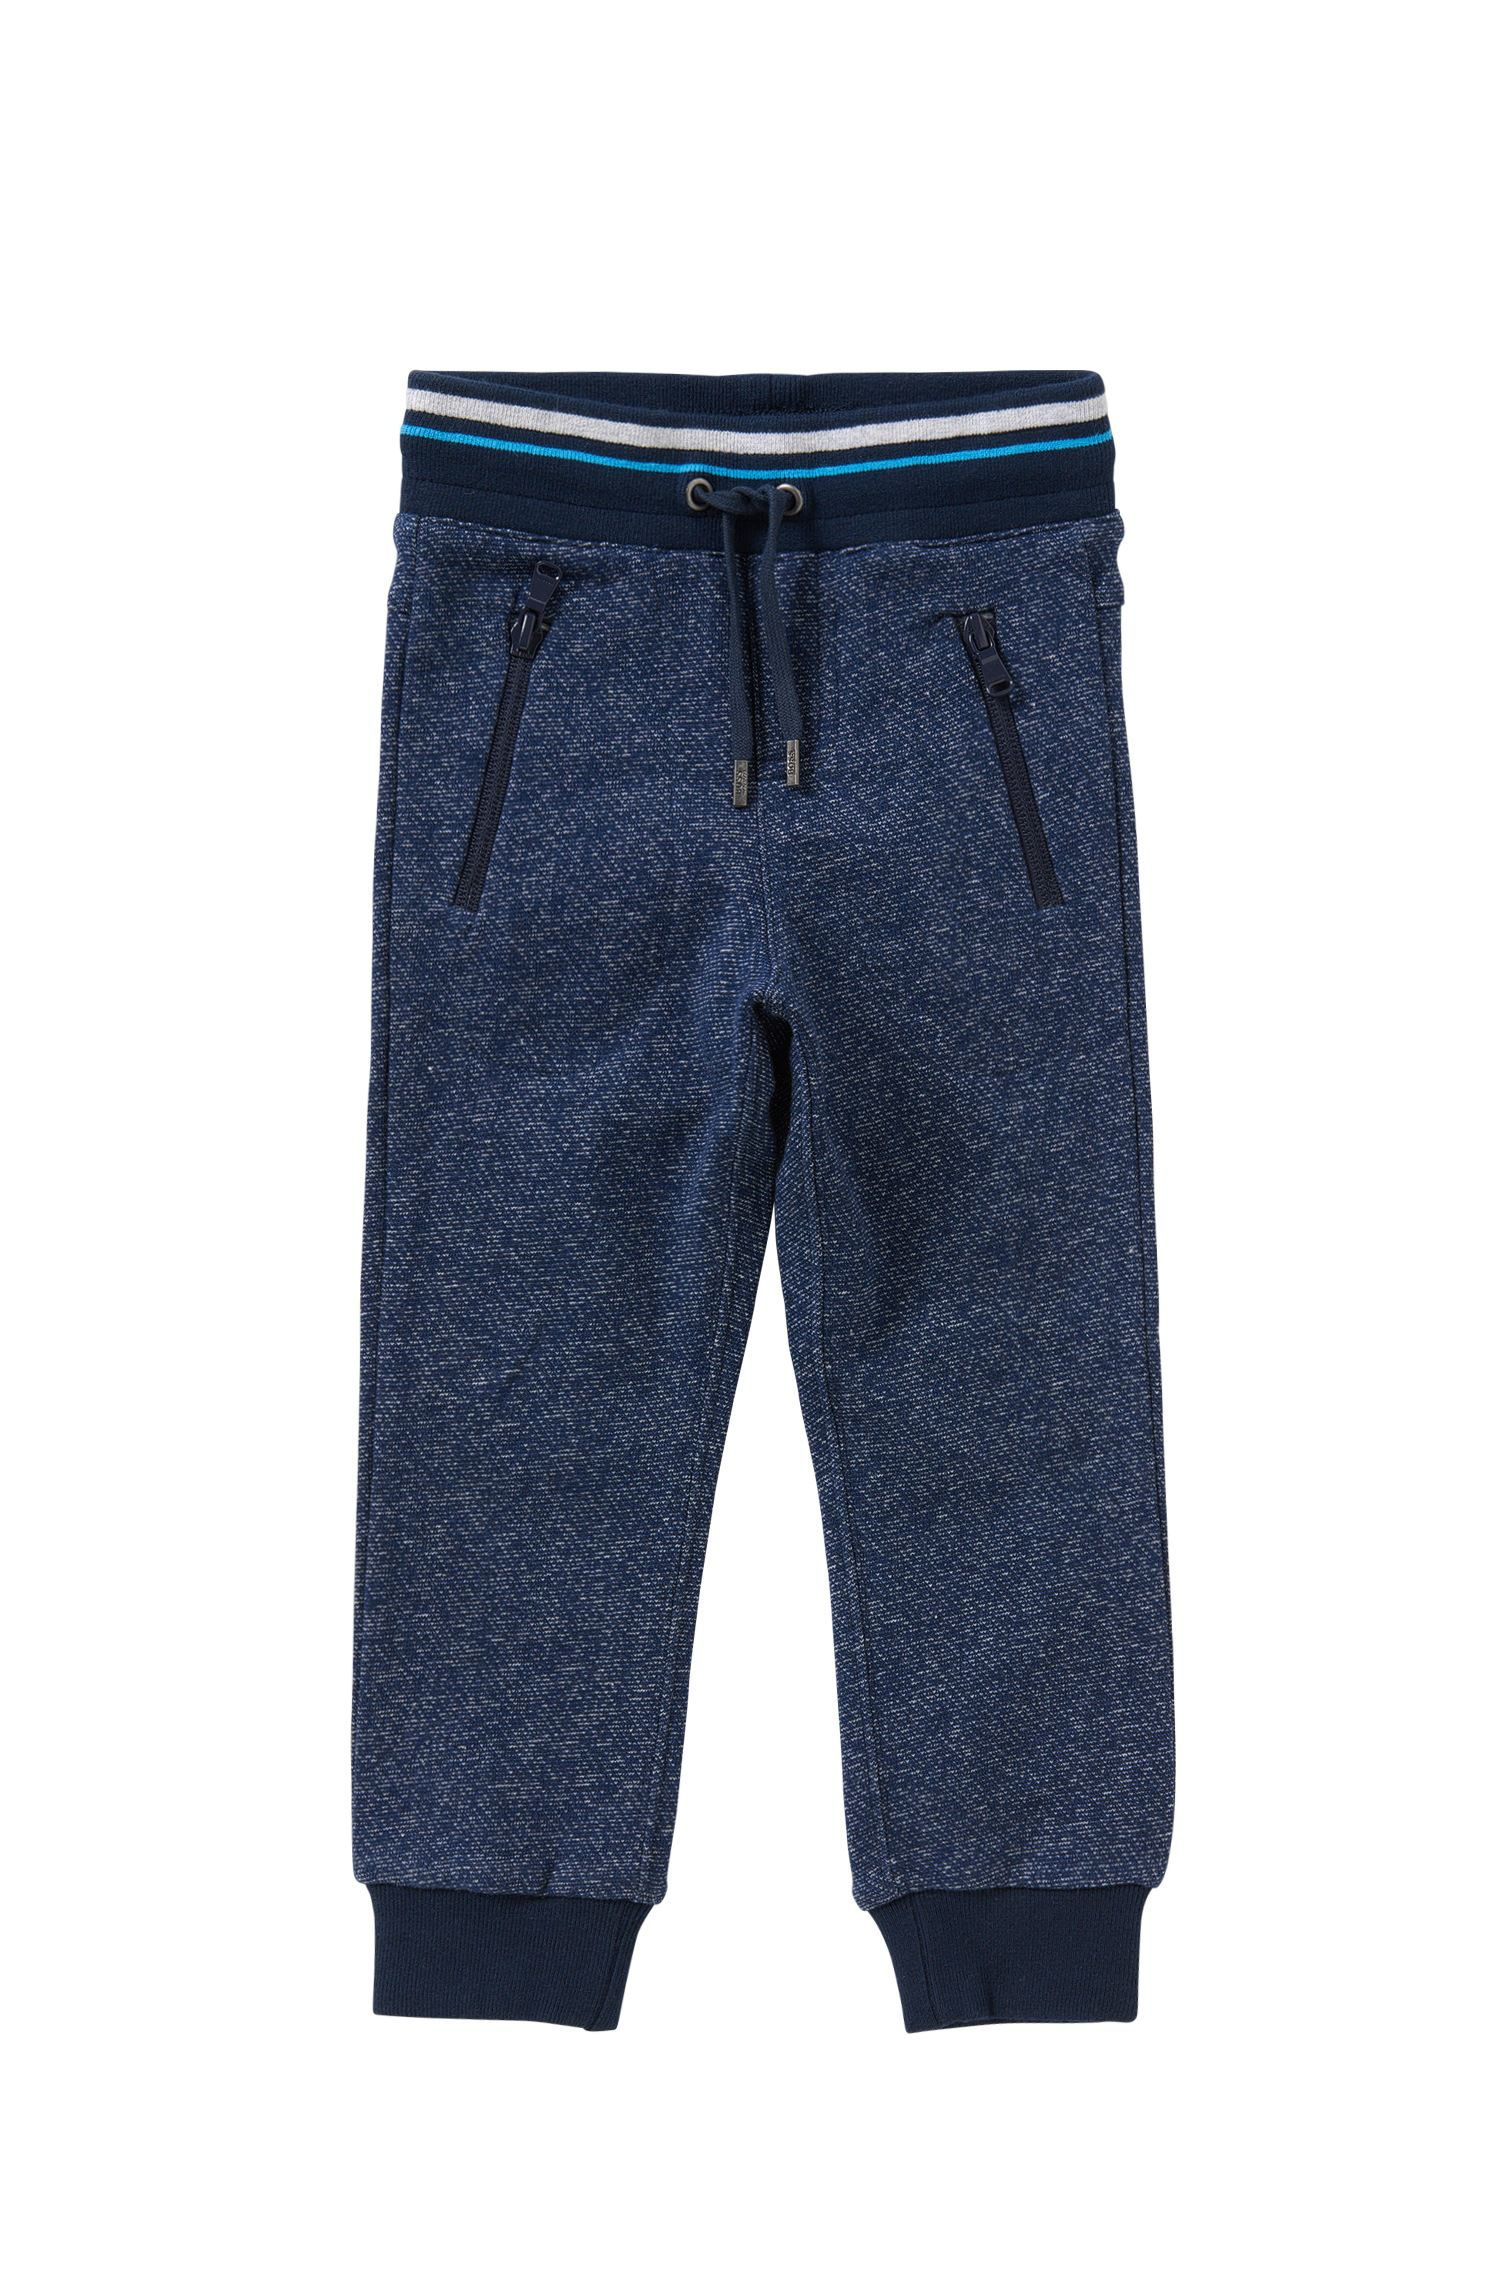 Pantalon sweat pour enfant en coton avec cordon de serrage: «J24392»